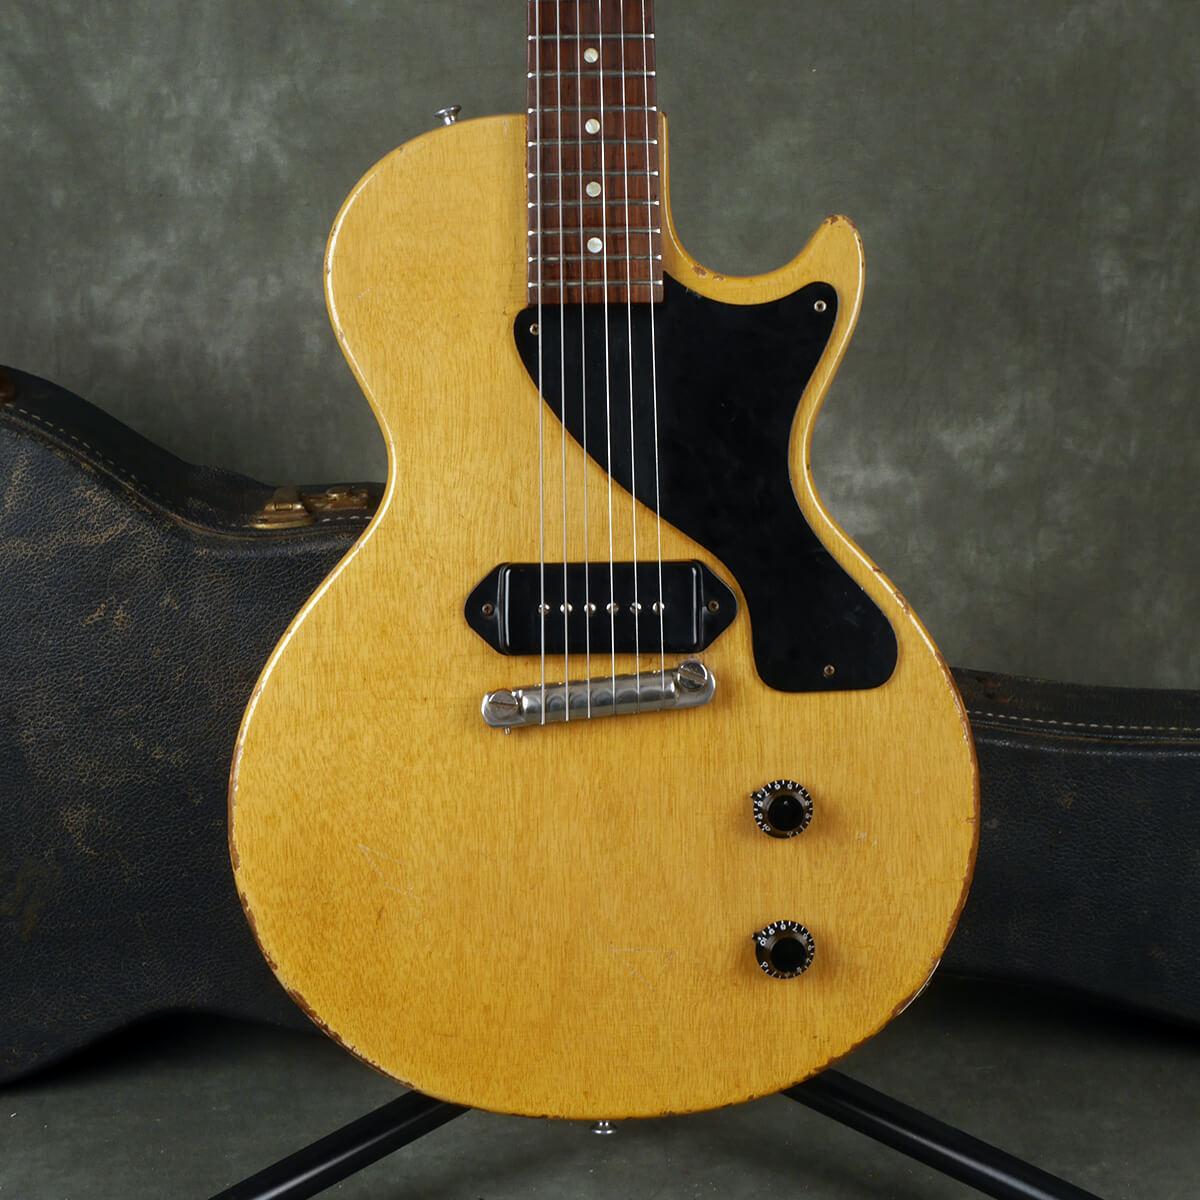 Gibson 1955 Original Les Paul Junior - TV Yellow w/Hard Case - 2nd Hand